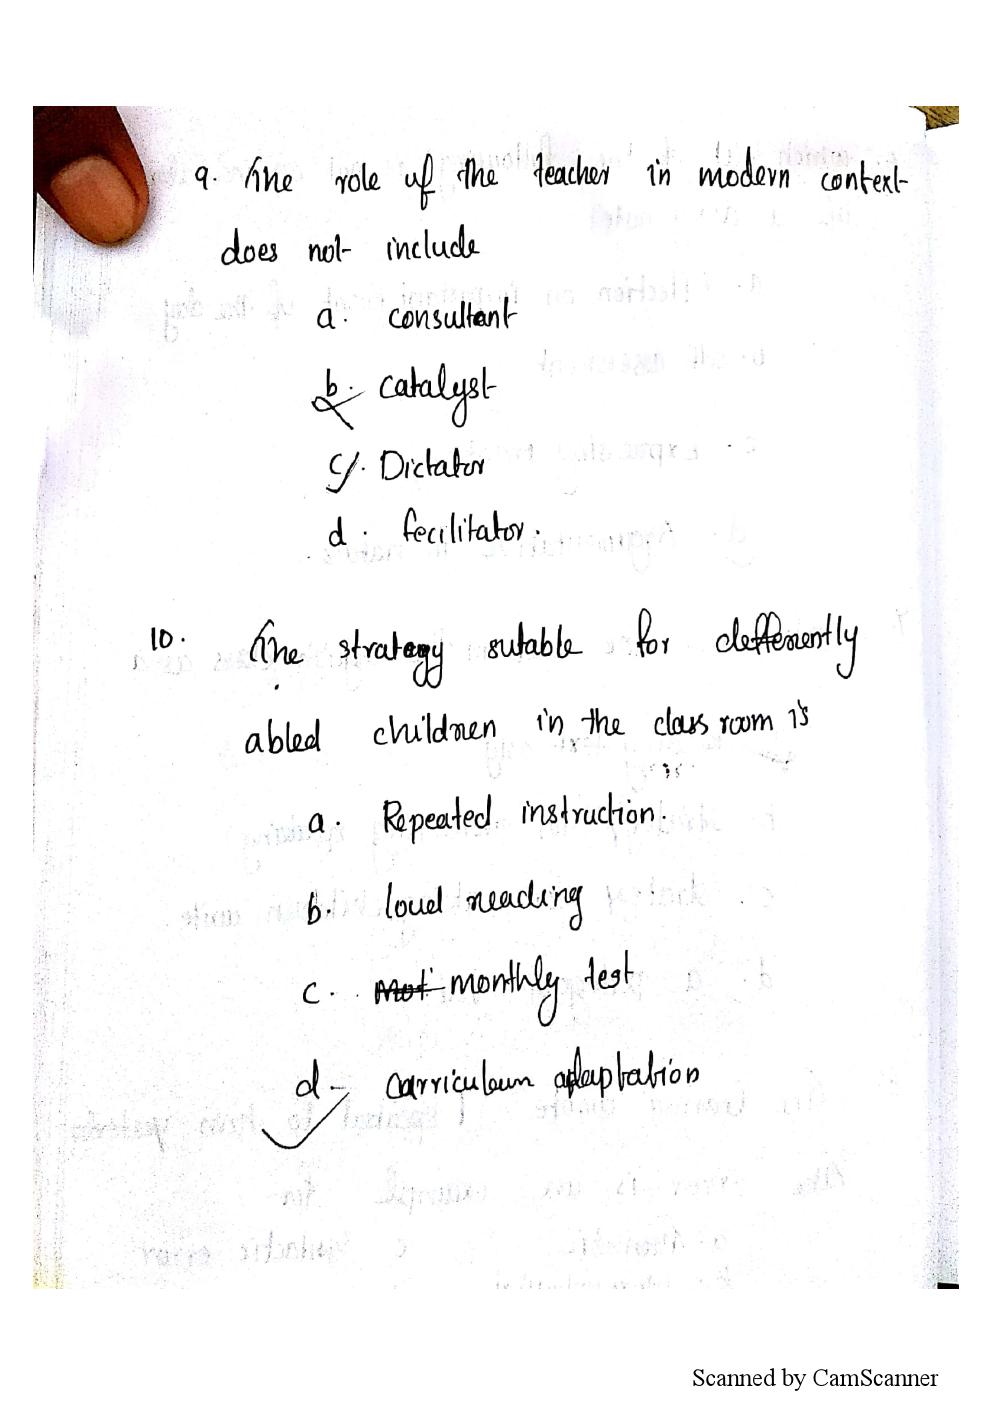 http://masterstudy.net/pdf/ktet_notes0087.png